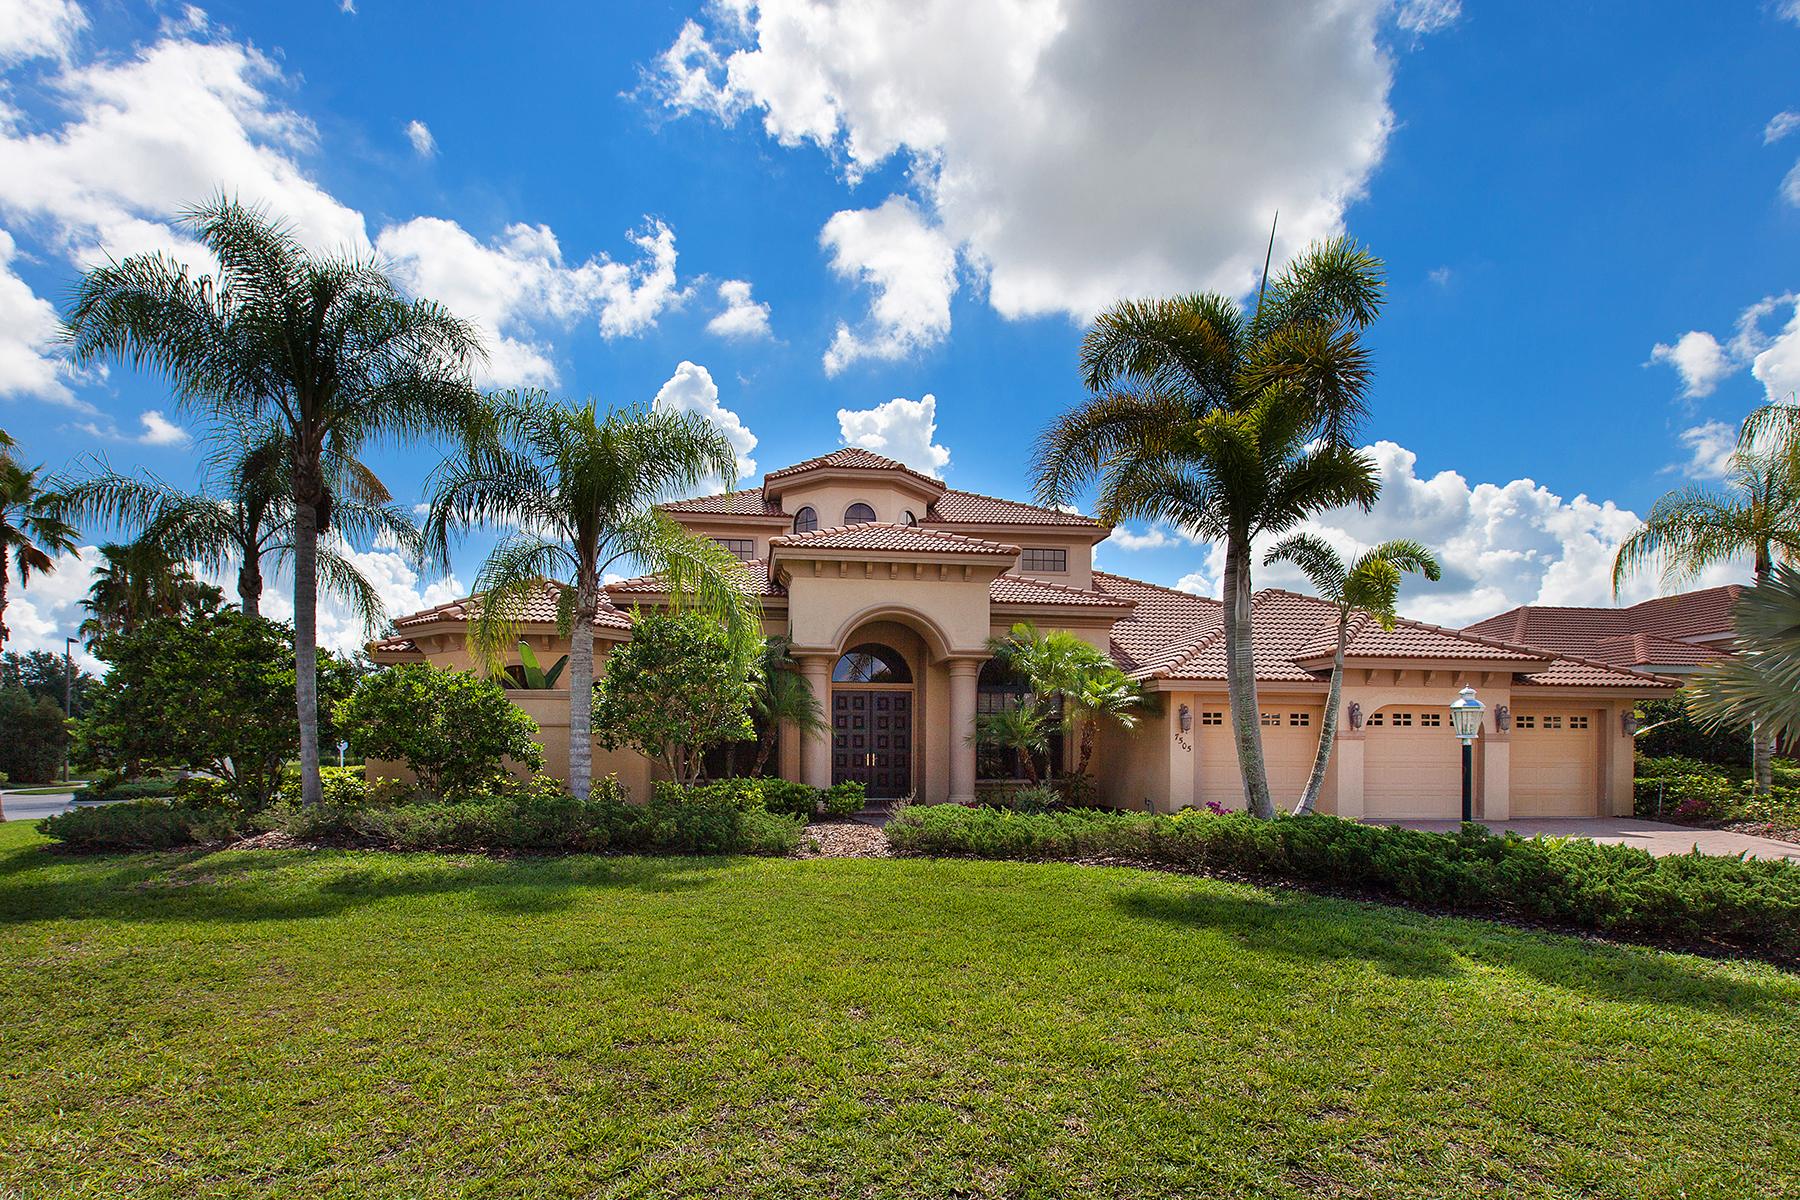 Casa para uma família para Venda às LAKEWOOD RANCH COUNTRY CLUB 7505 Rigby Ct Lakewood Ranch, Florida 34202 Estados Unidos